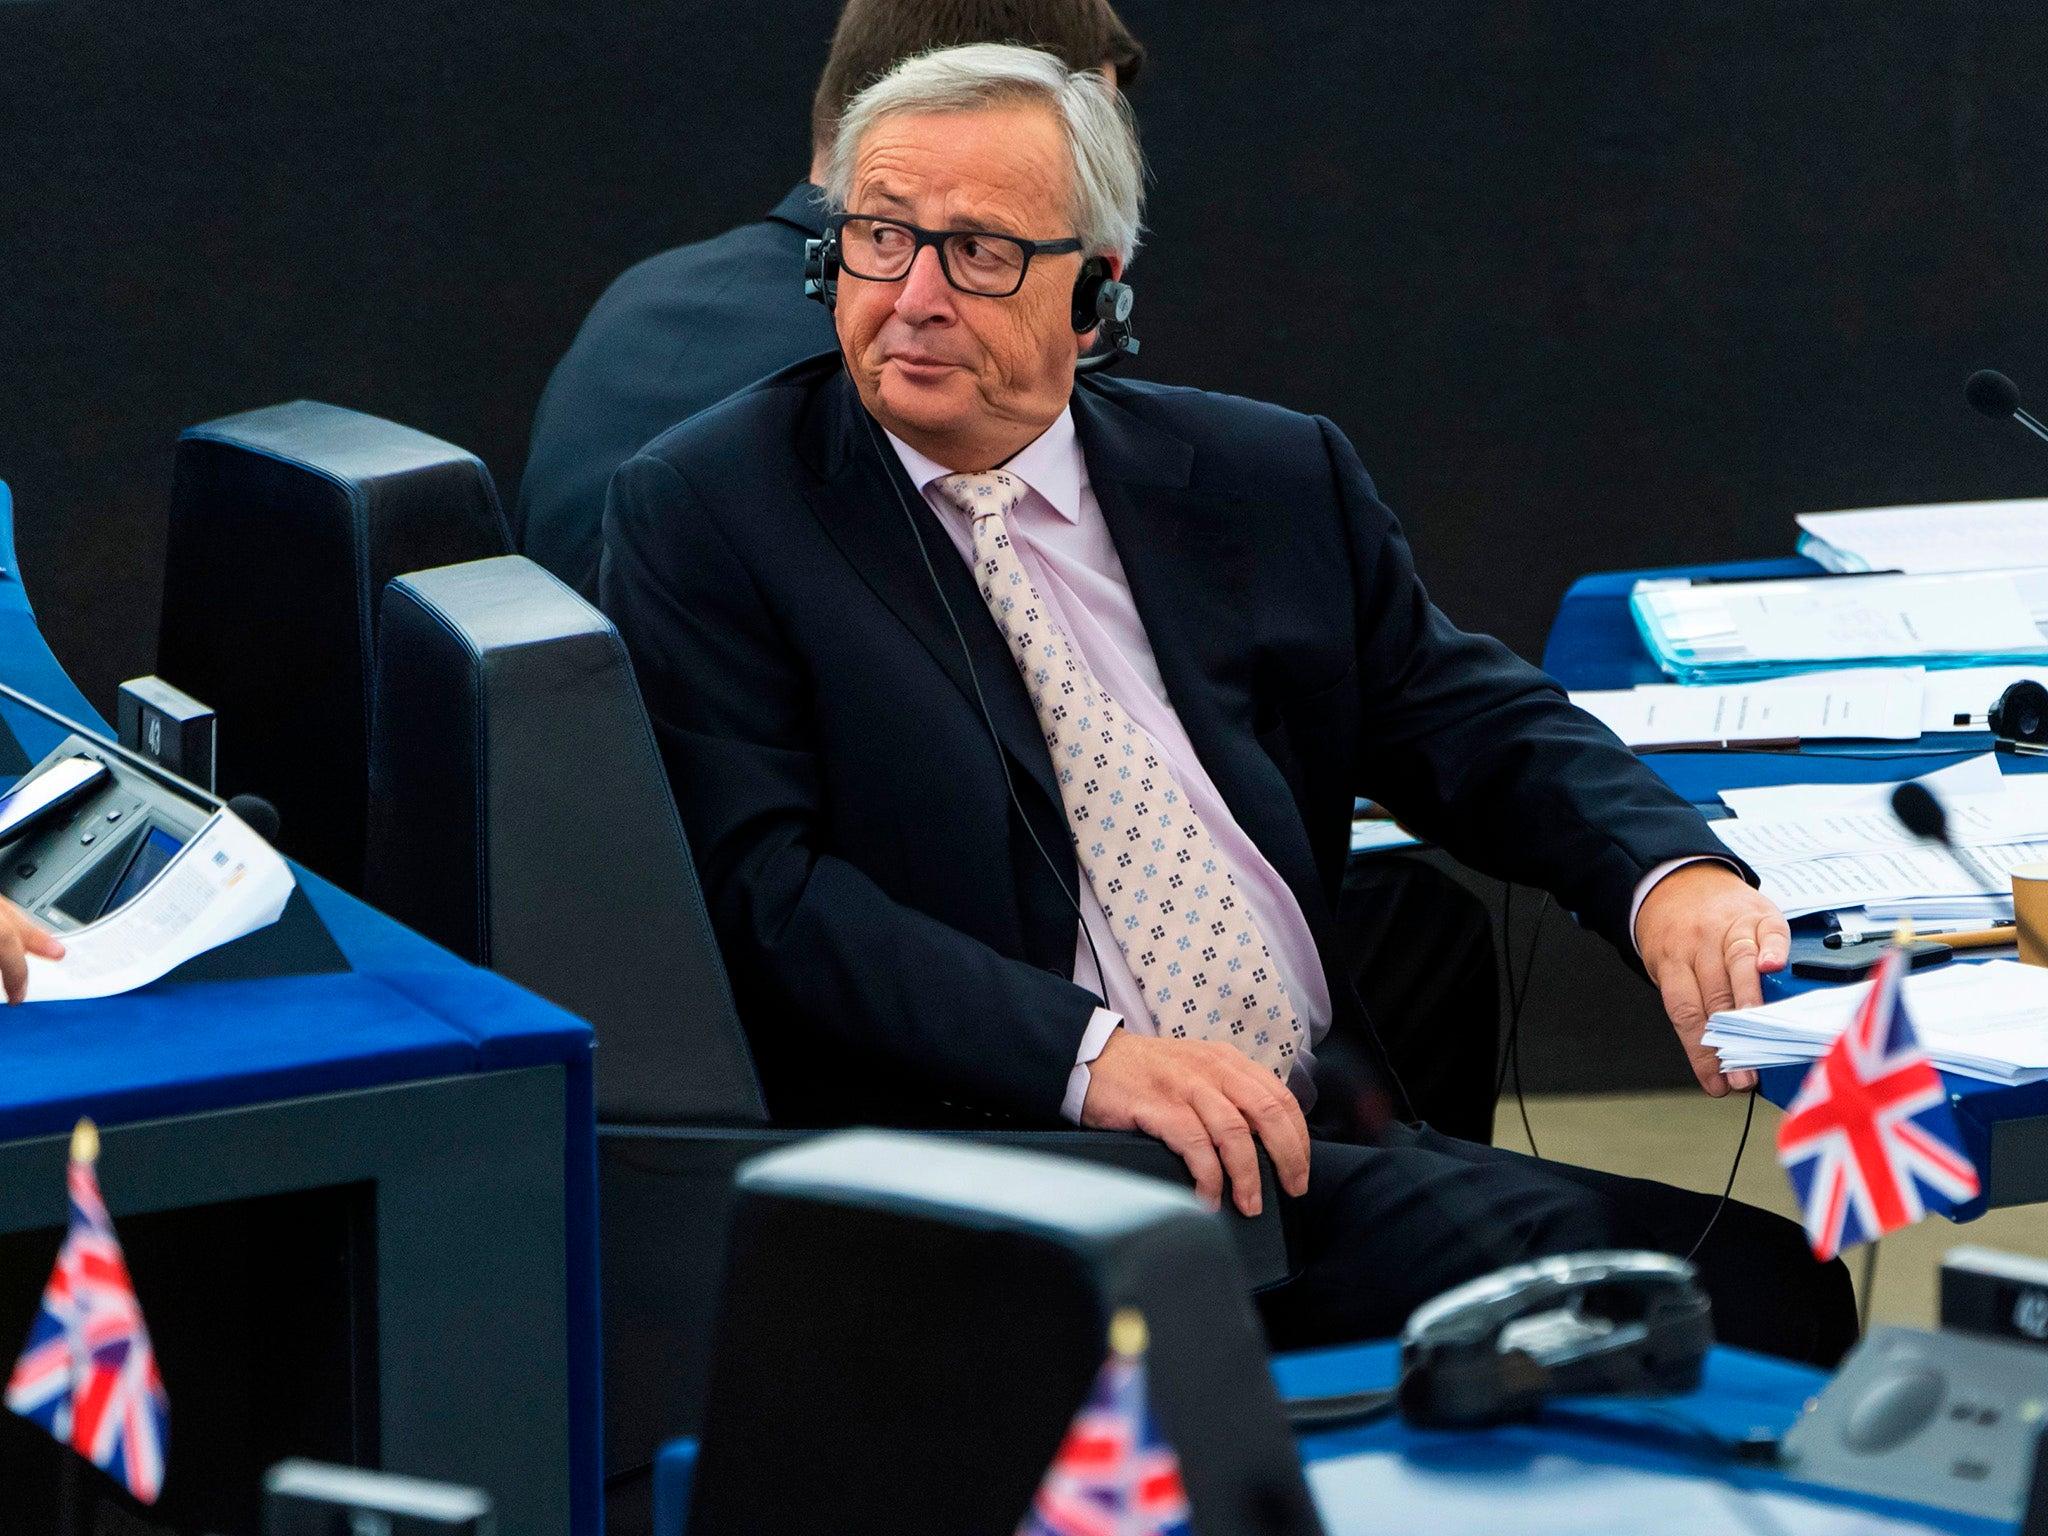 Jean-Claude Juncker says UK should rejoin EU after Brexit using Article 49